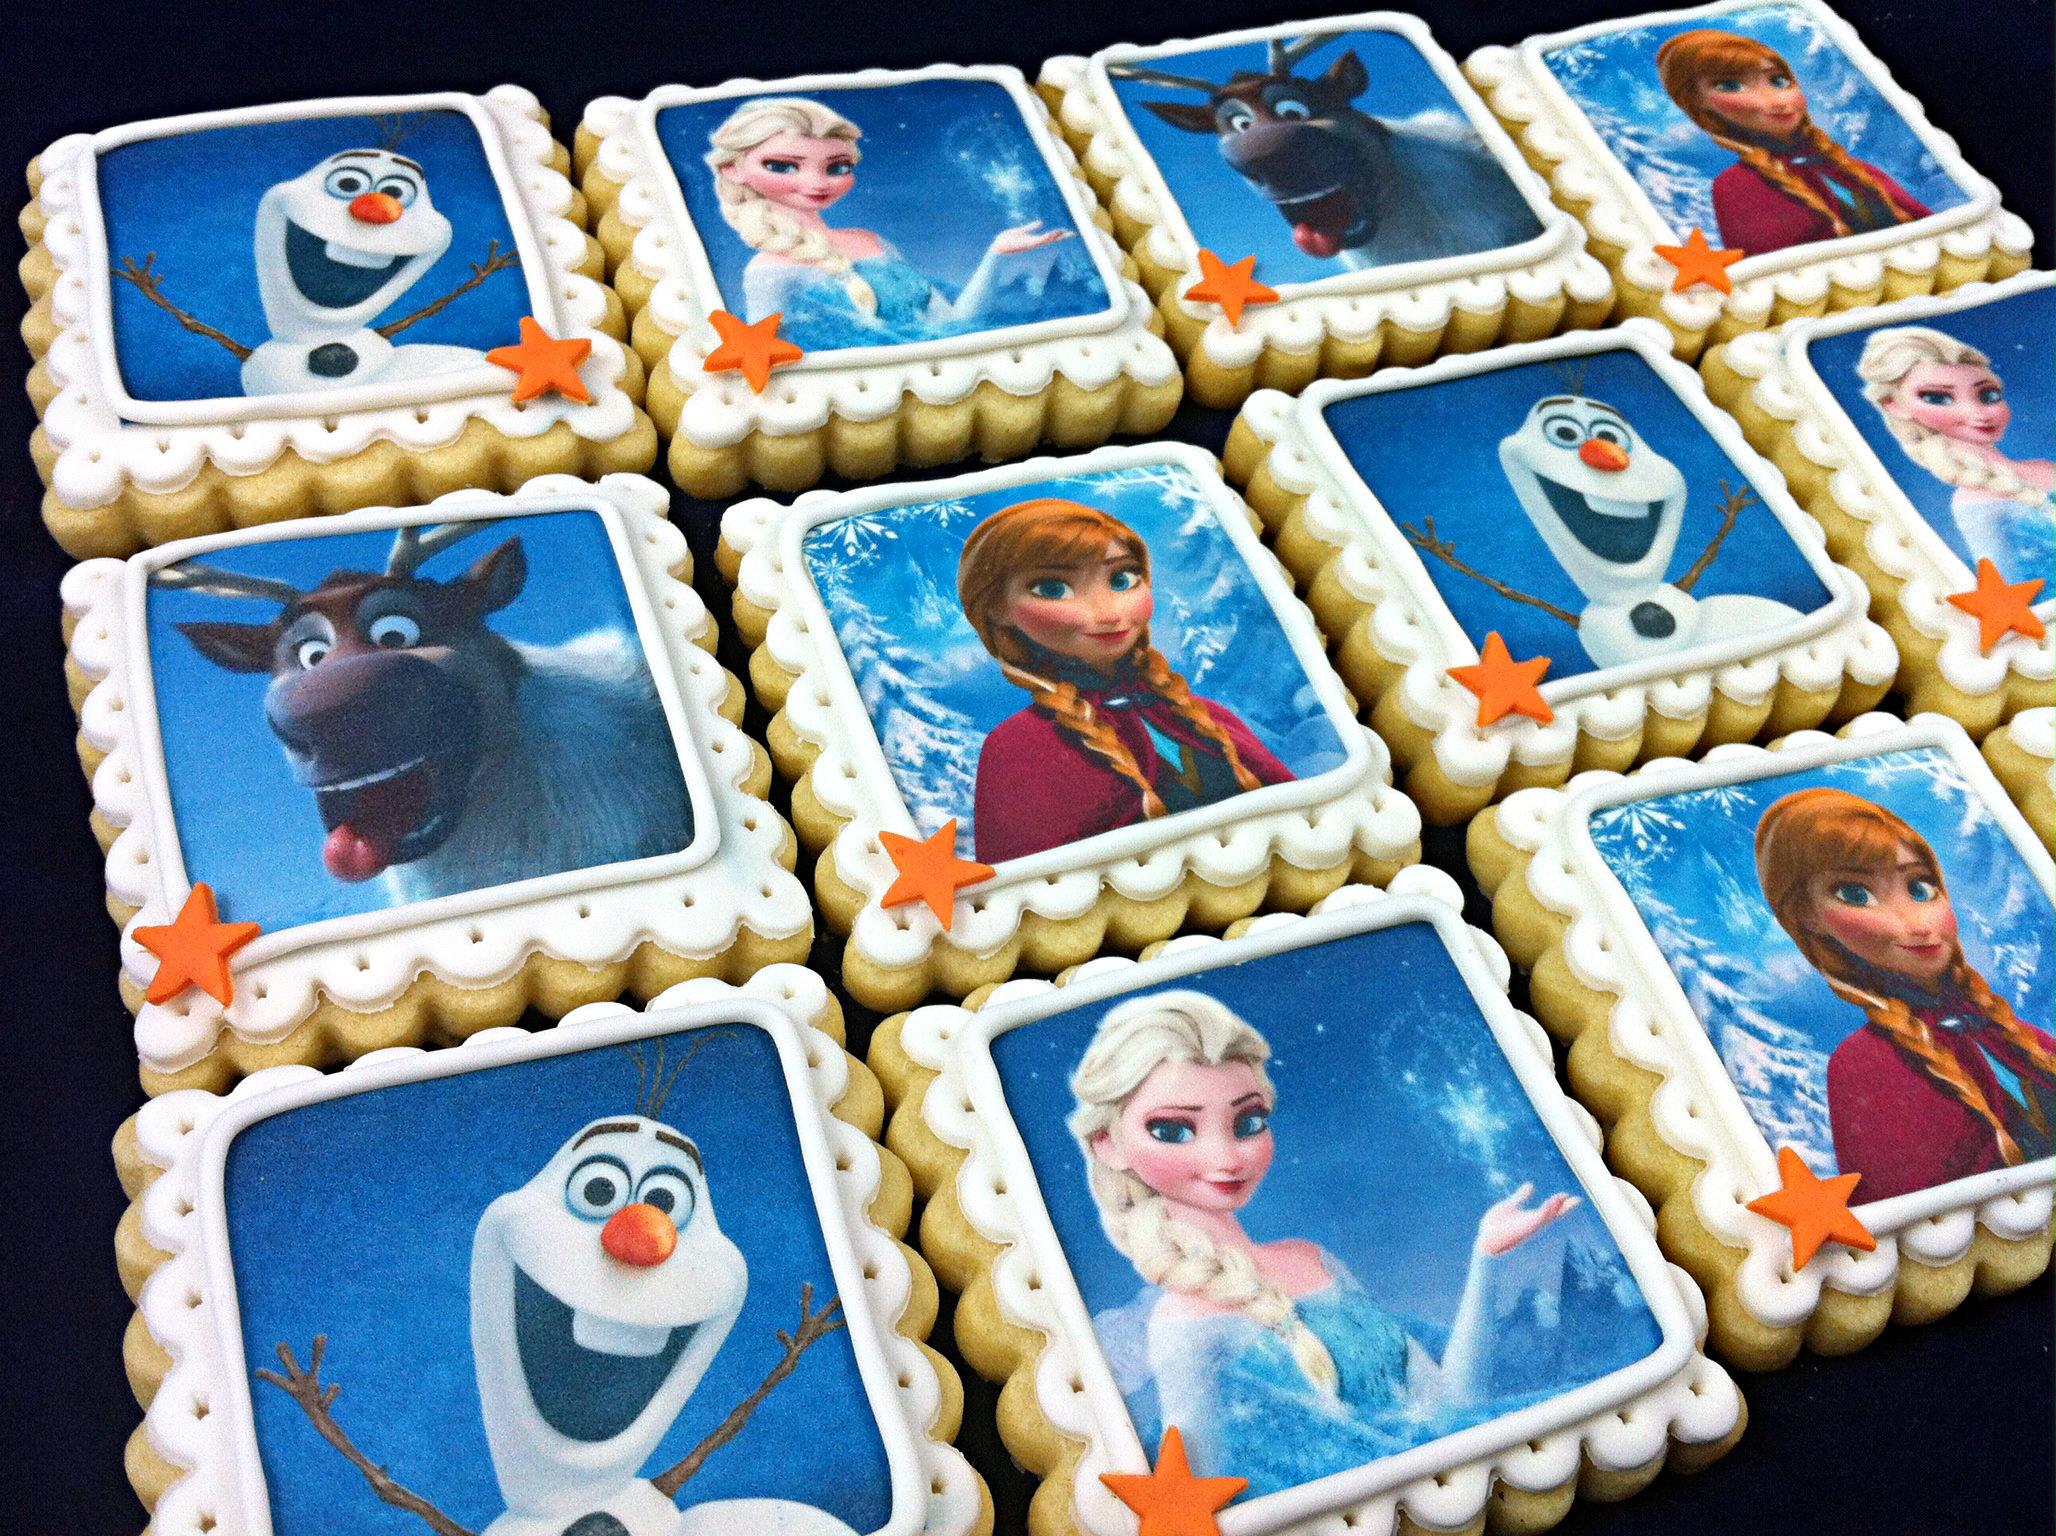 Galletas-Frozen-metienestarta.jpg